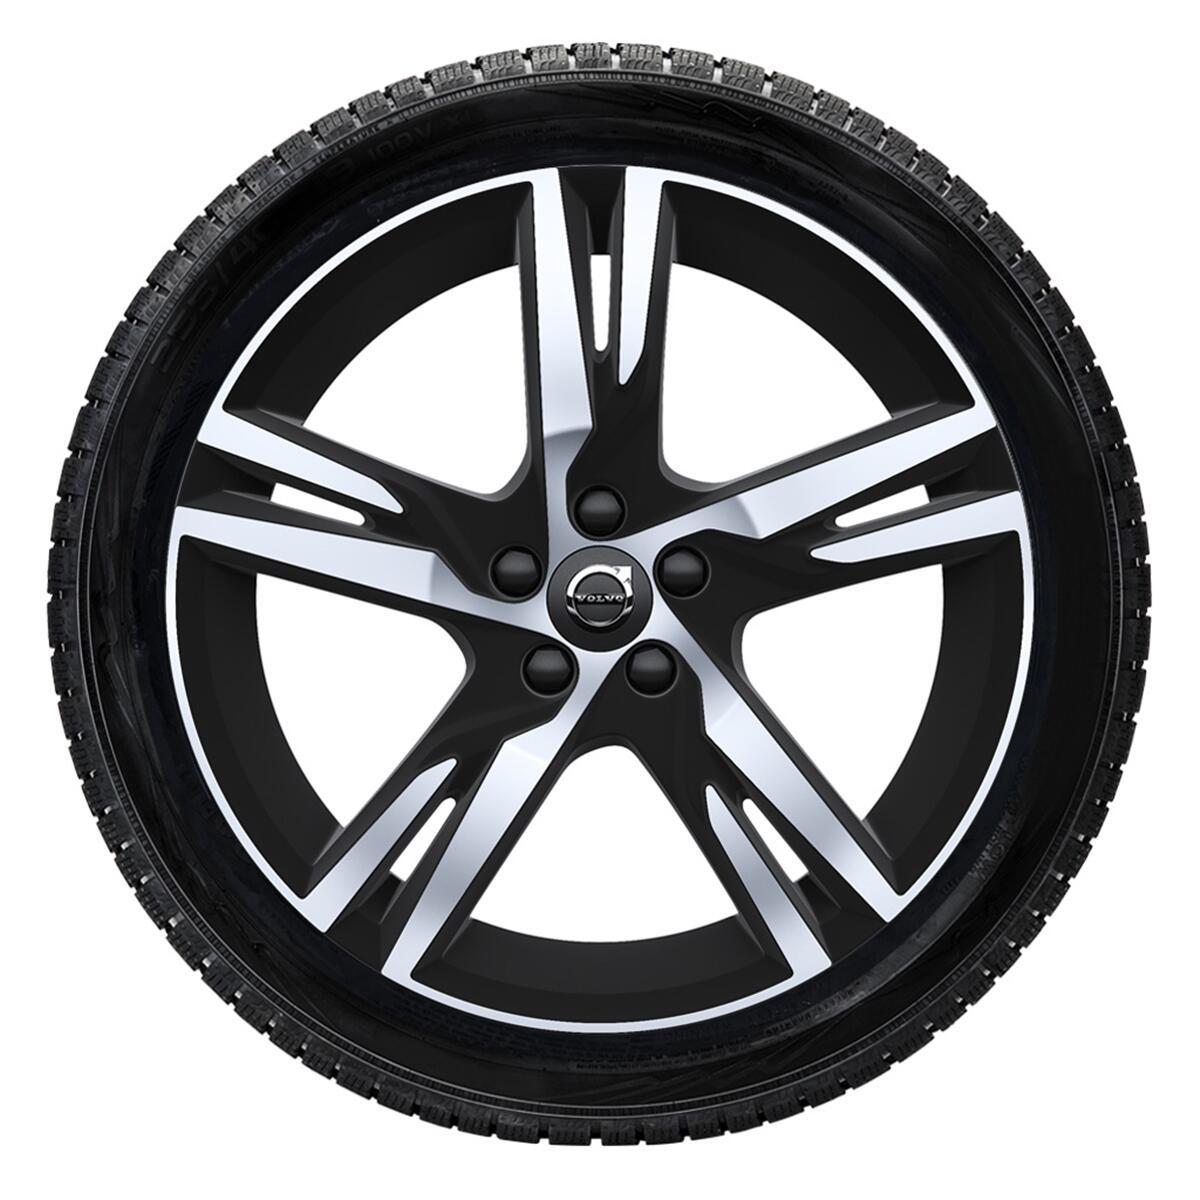 Komplet zimskih koles: 48,26 cm (19''), pnevmatike Continental